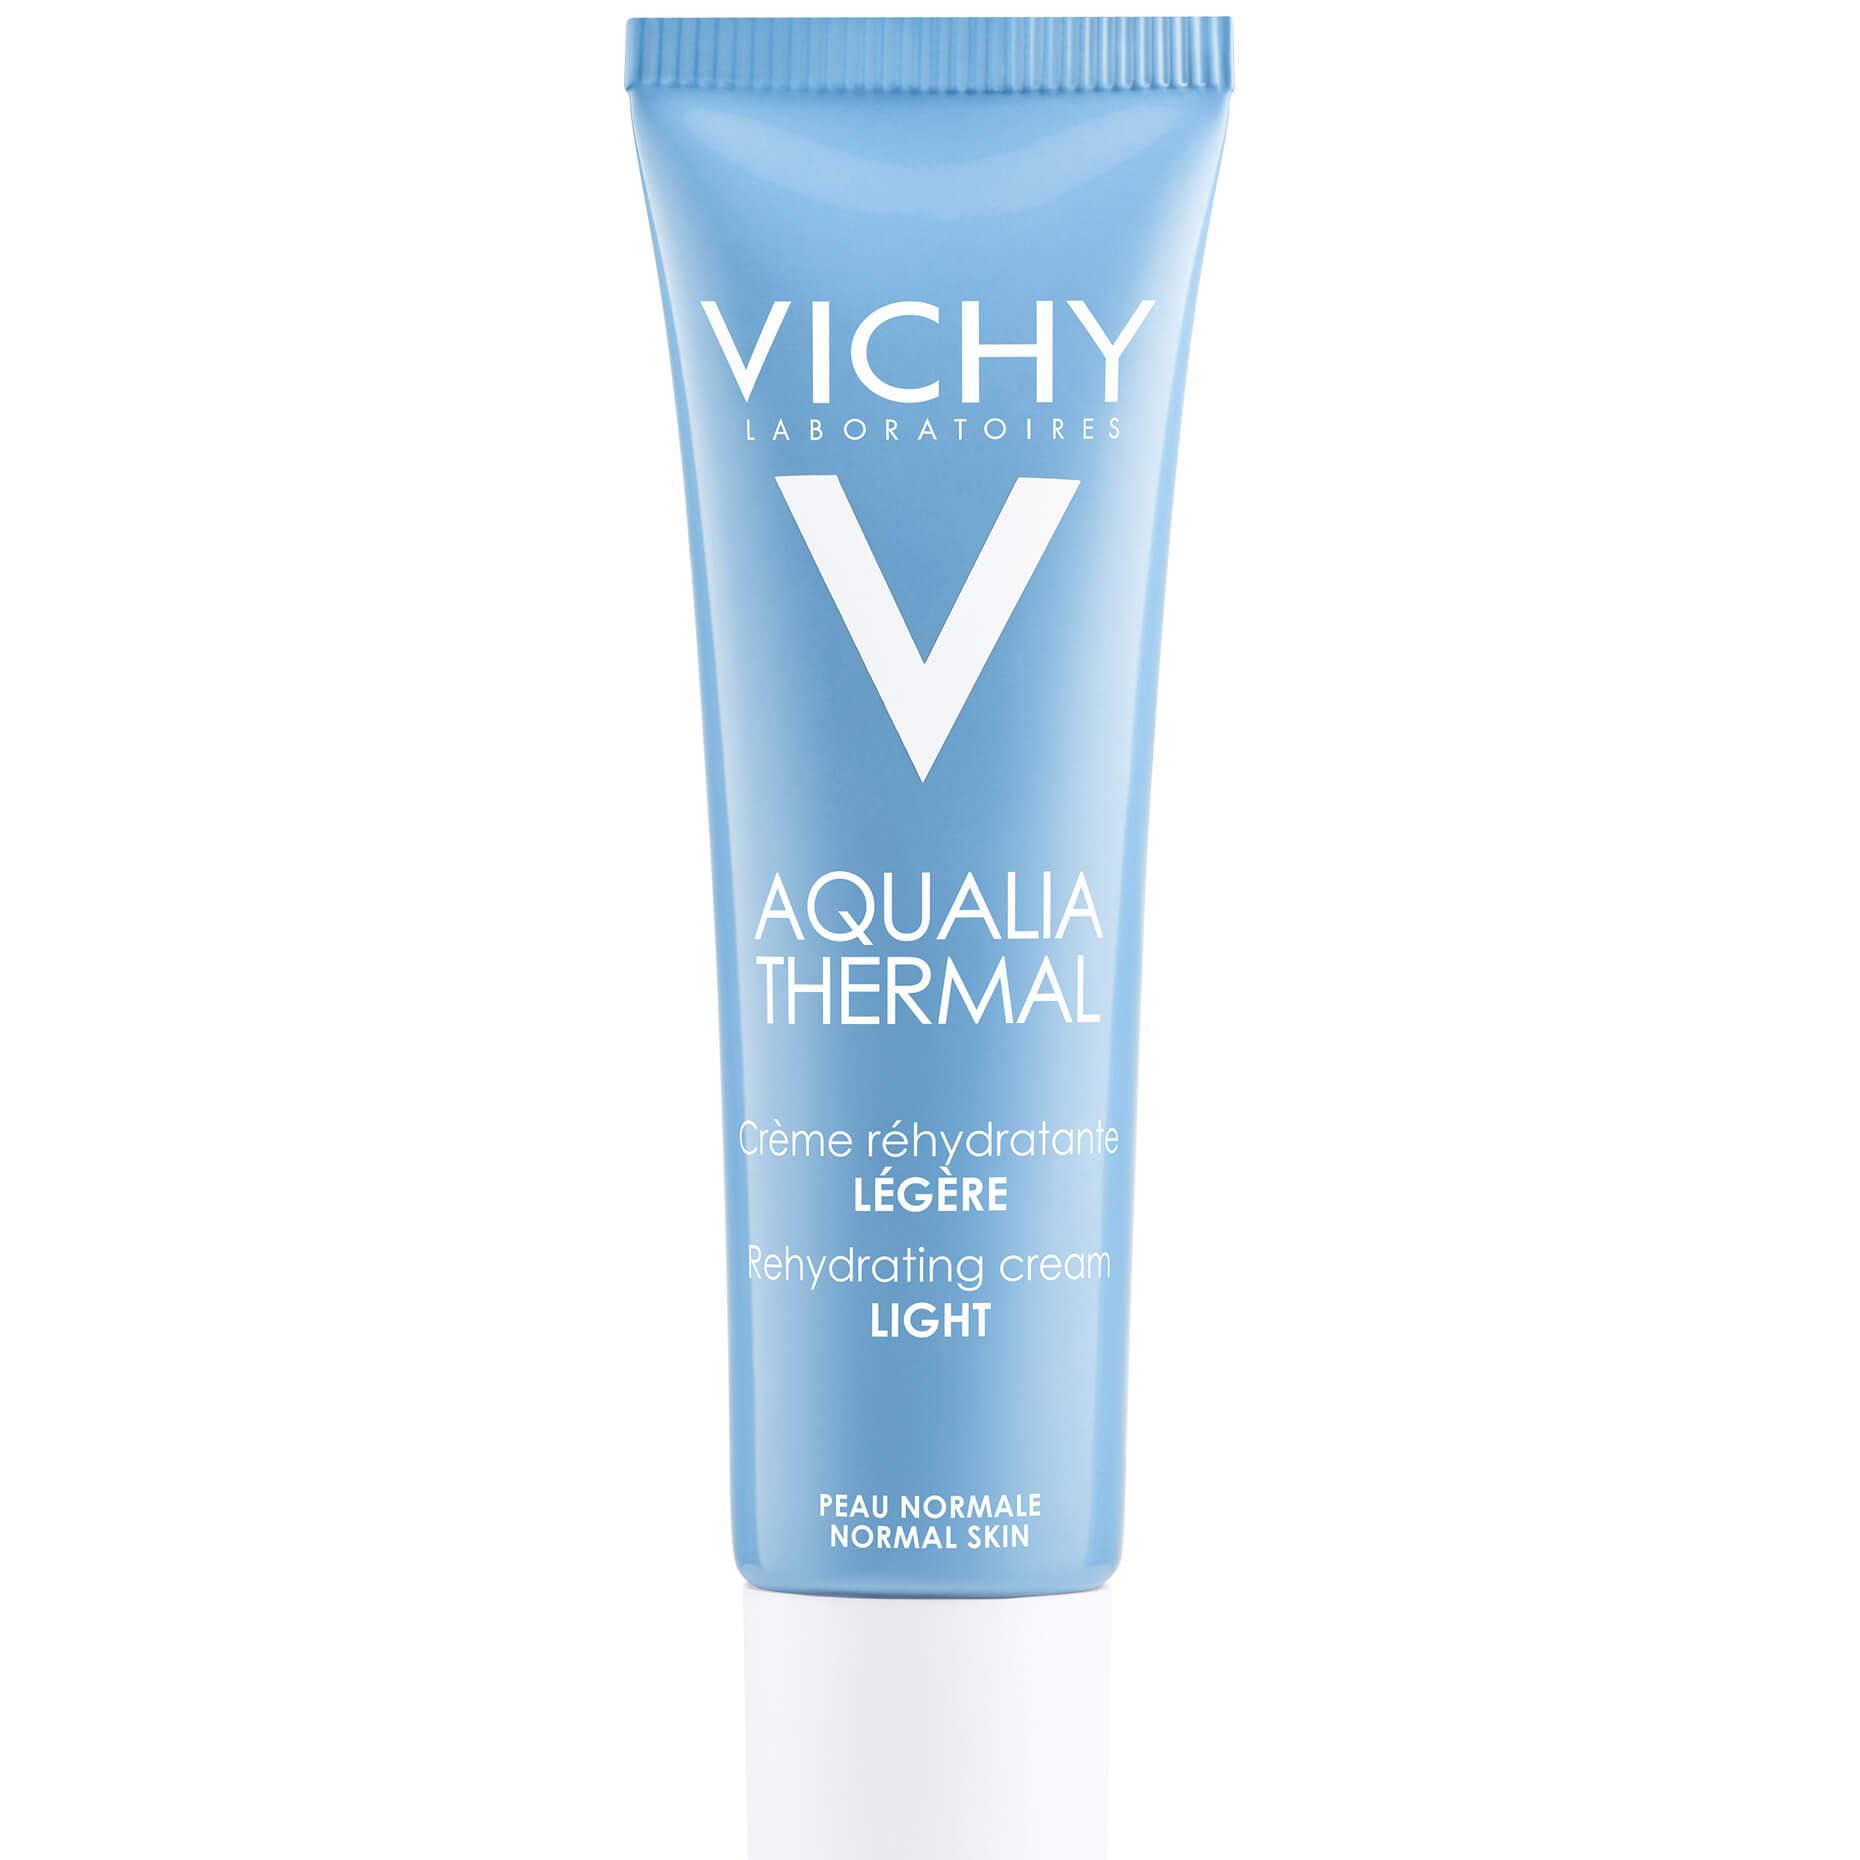 Vichy Aqualia Thermal Legere Rehydrating Cream Ενυδατική Κρέμα ΗμέραςΕλαφριάς Υ ομορφιά   ενυδάτωση προσώπου   ενυδάτωση ημέρας